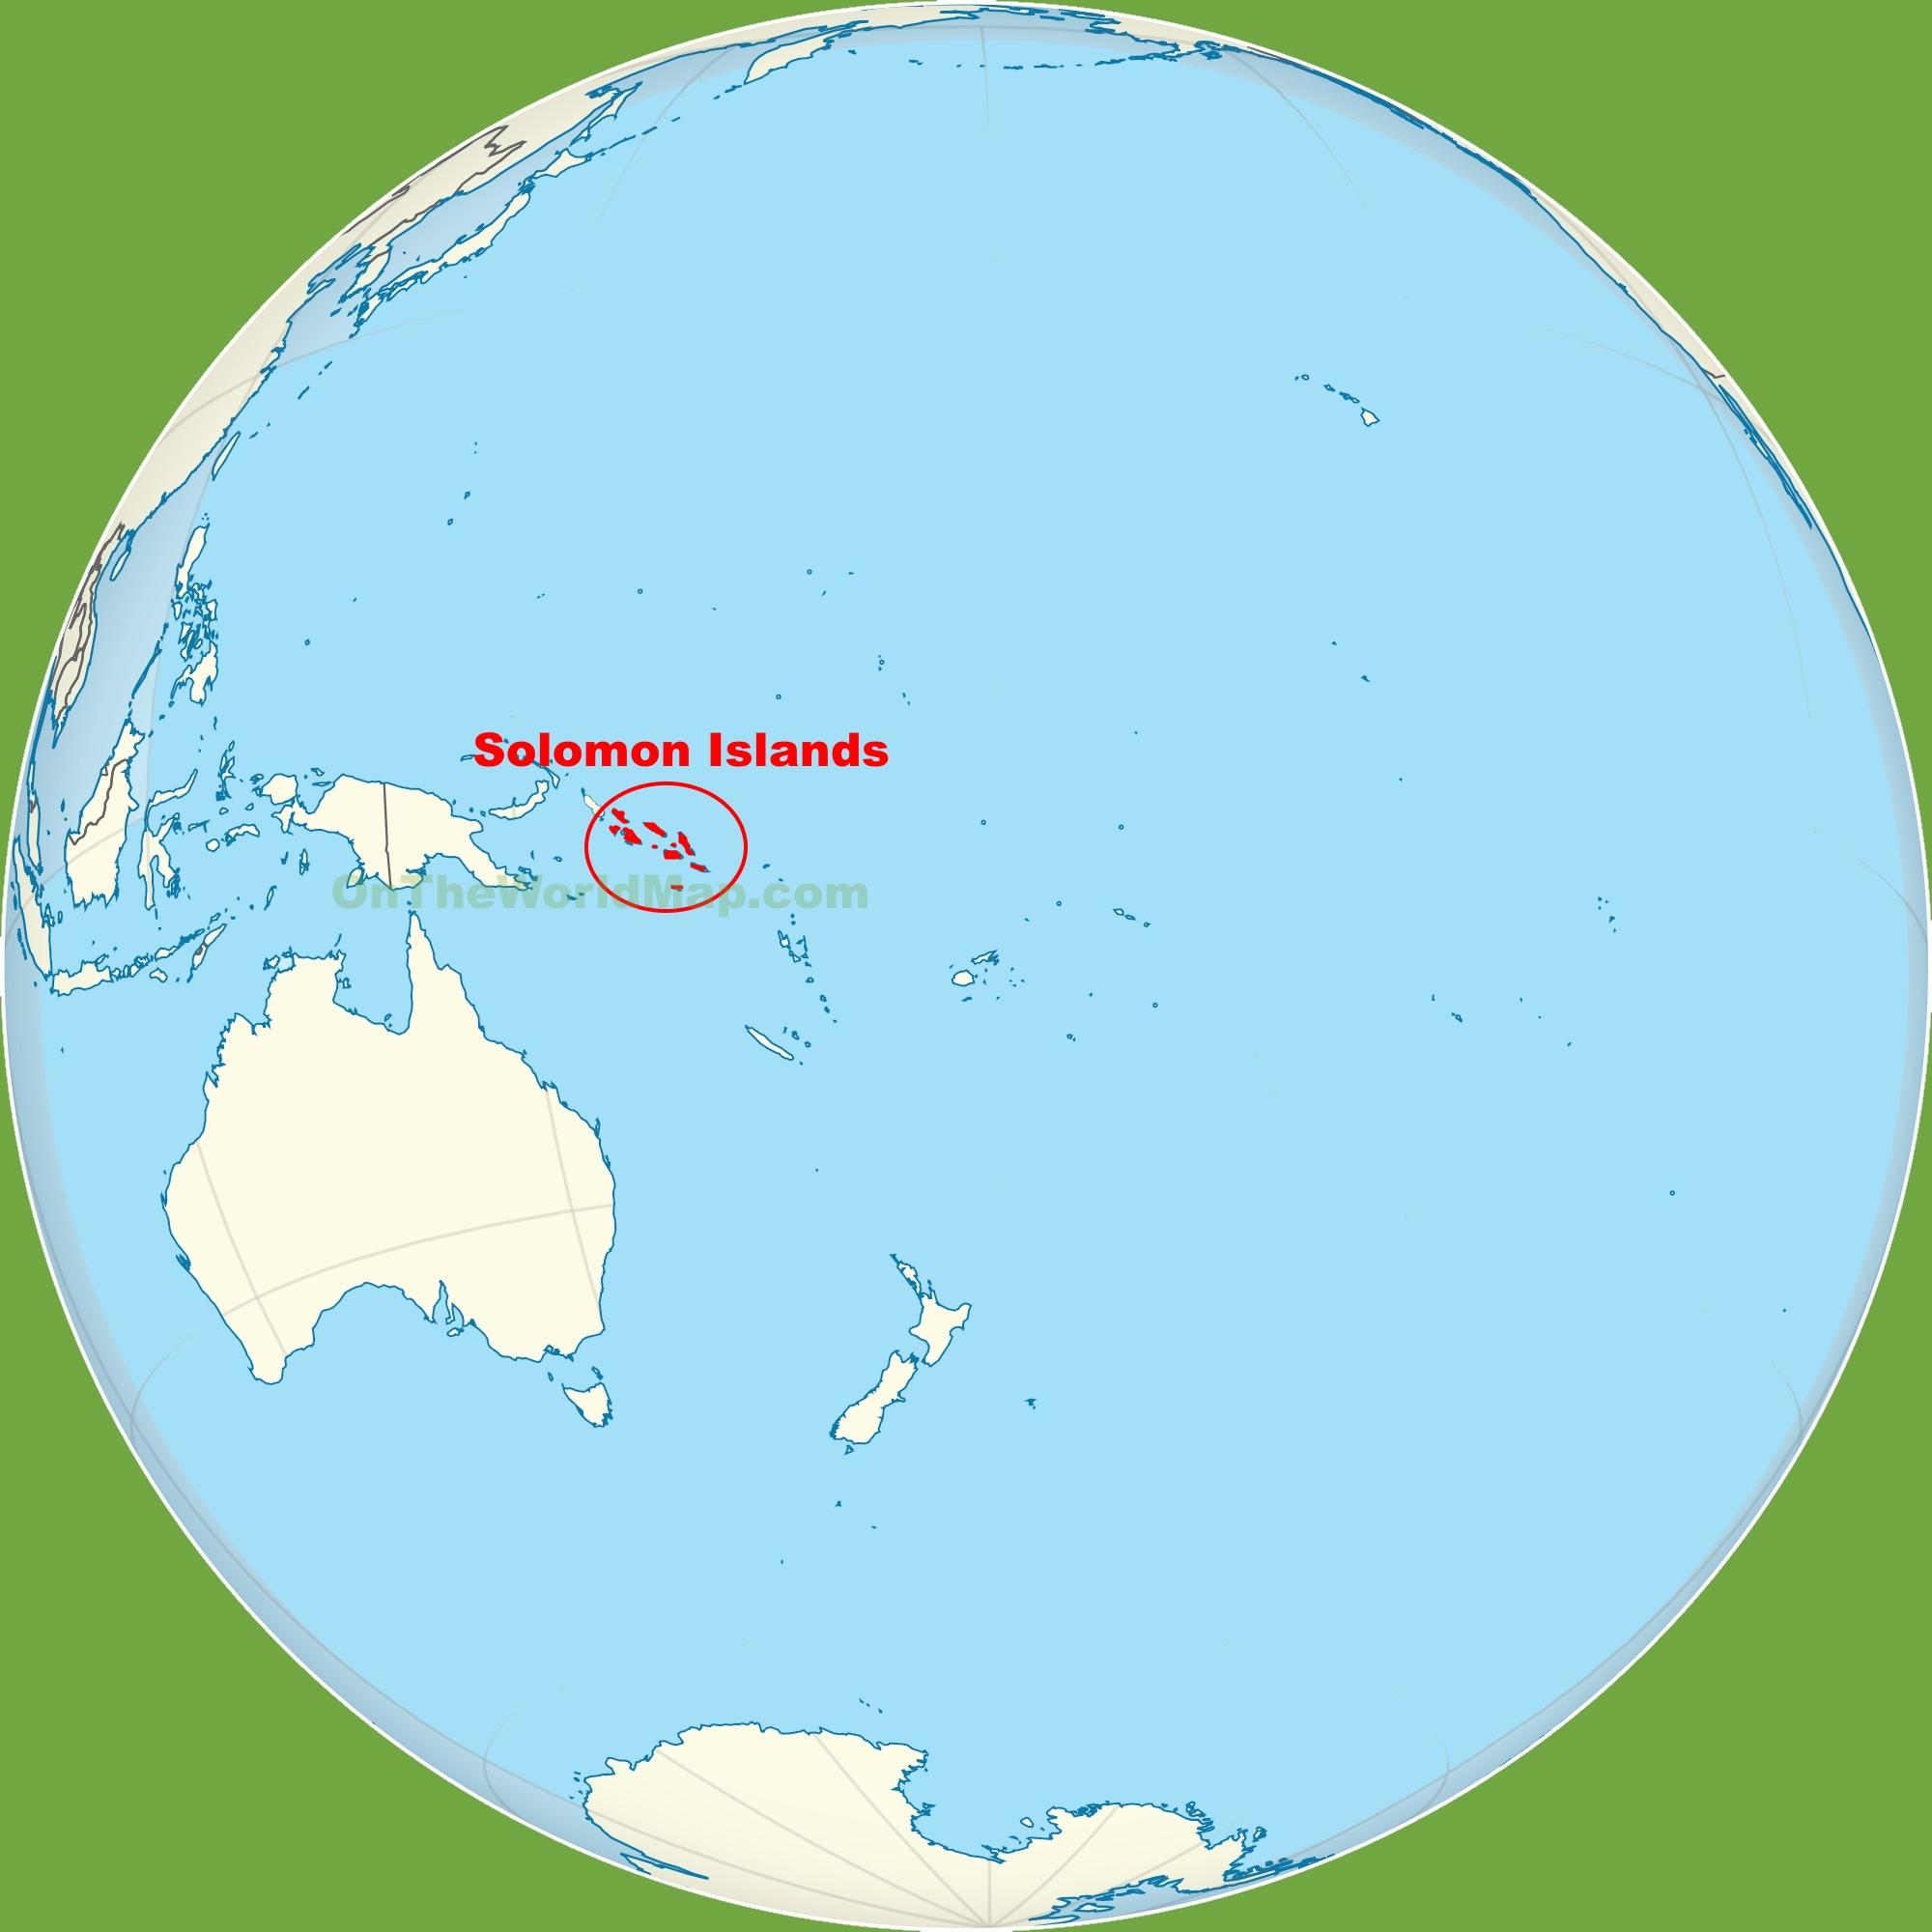 Solomon Islands location on the Pacific Ocean map